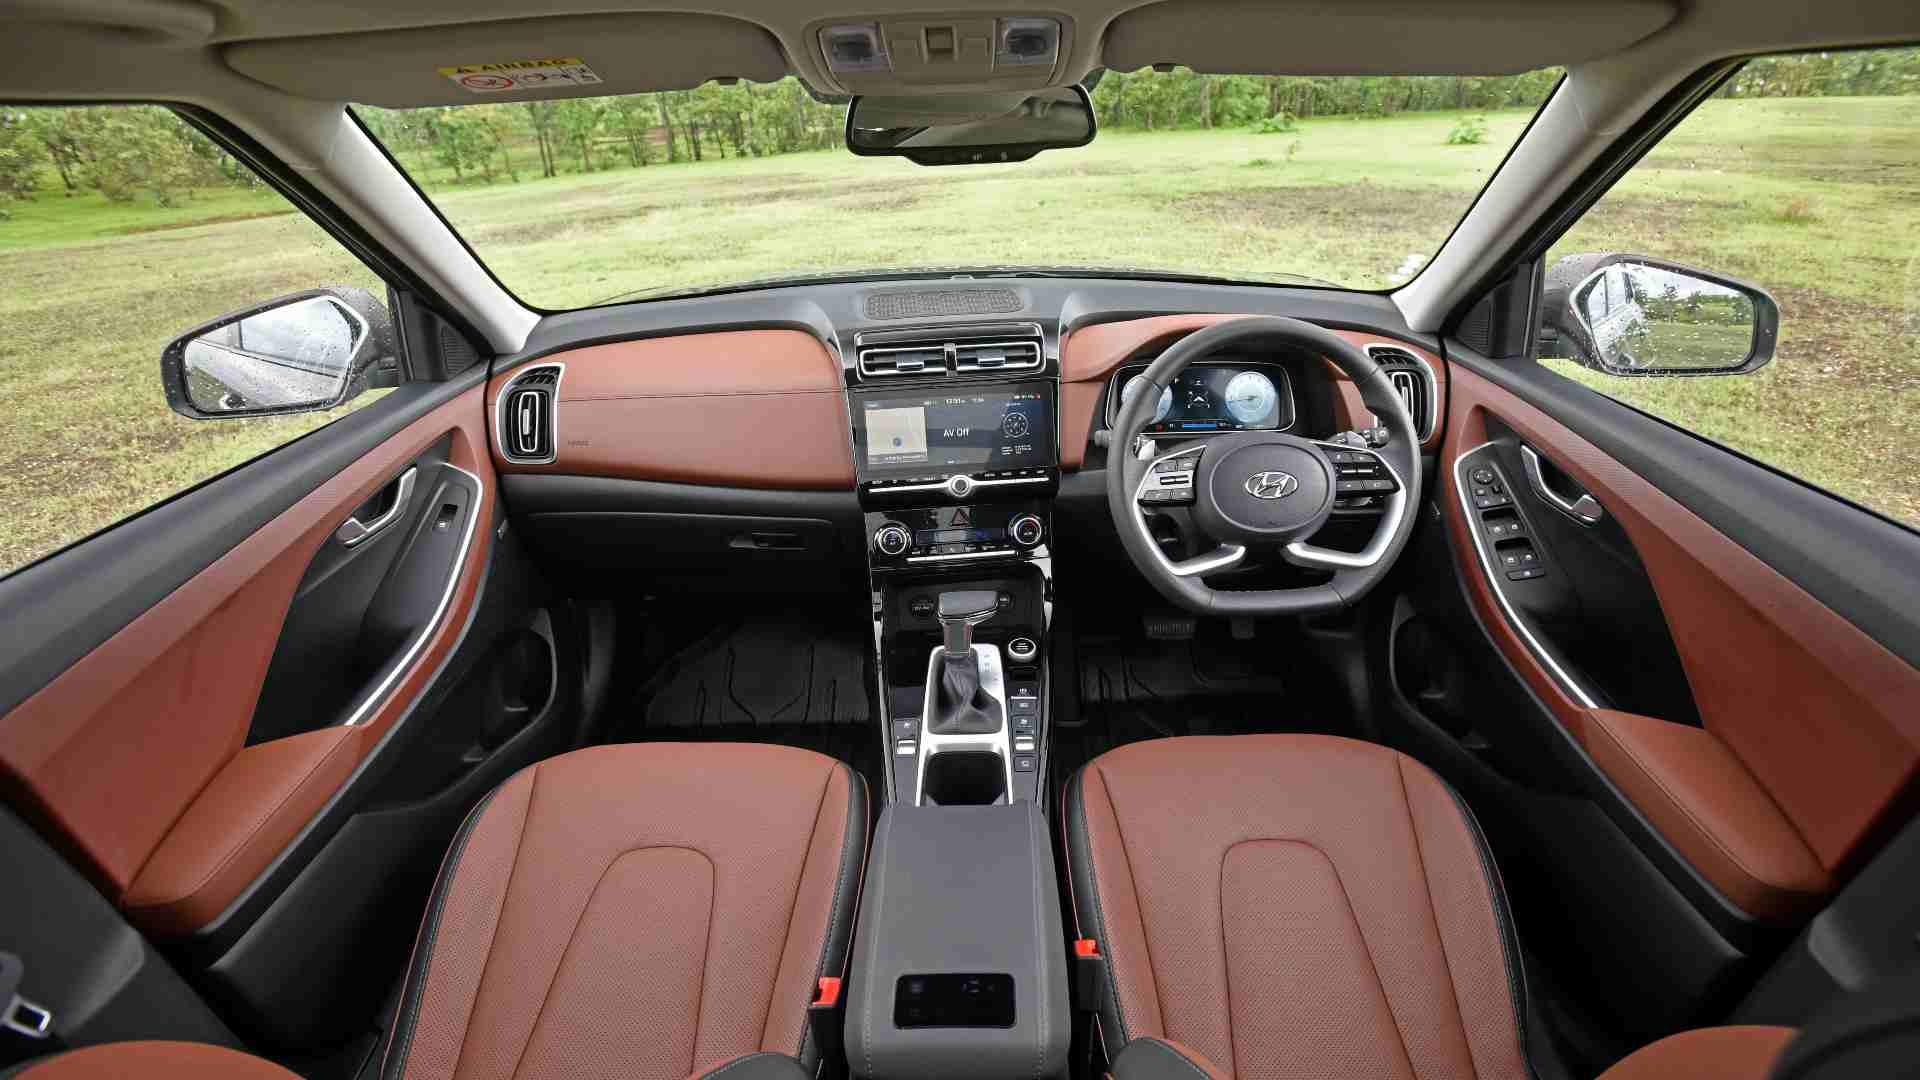 Alcazar is fairly spacious on the inside and well organized.Image: Hyundai